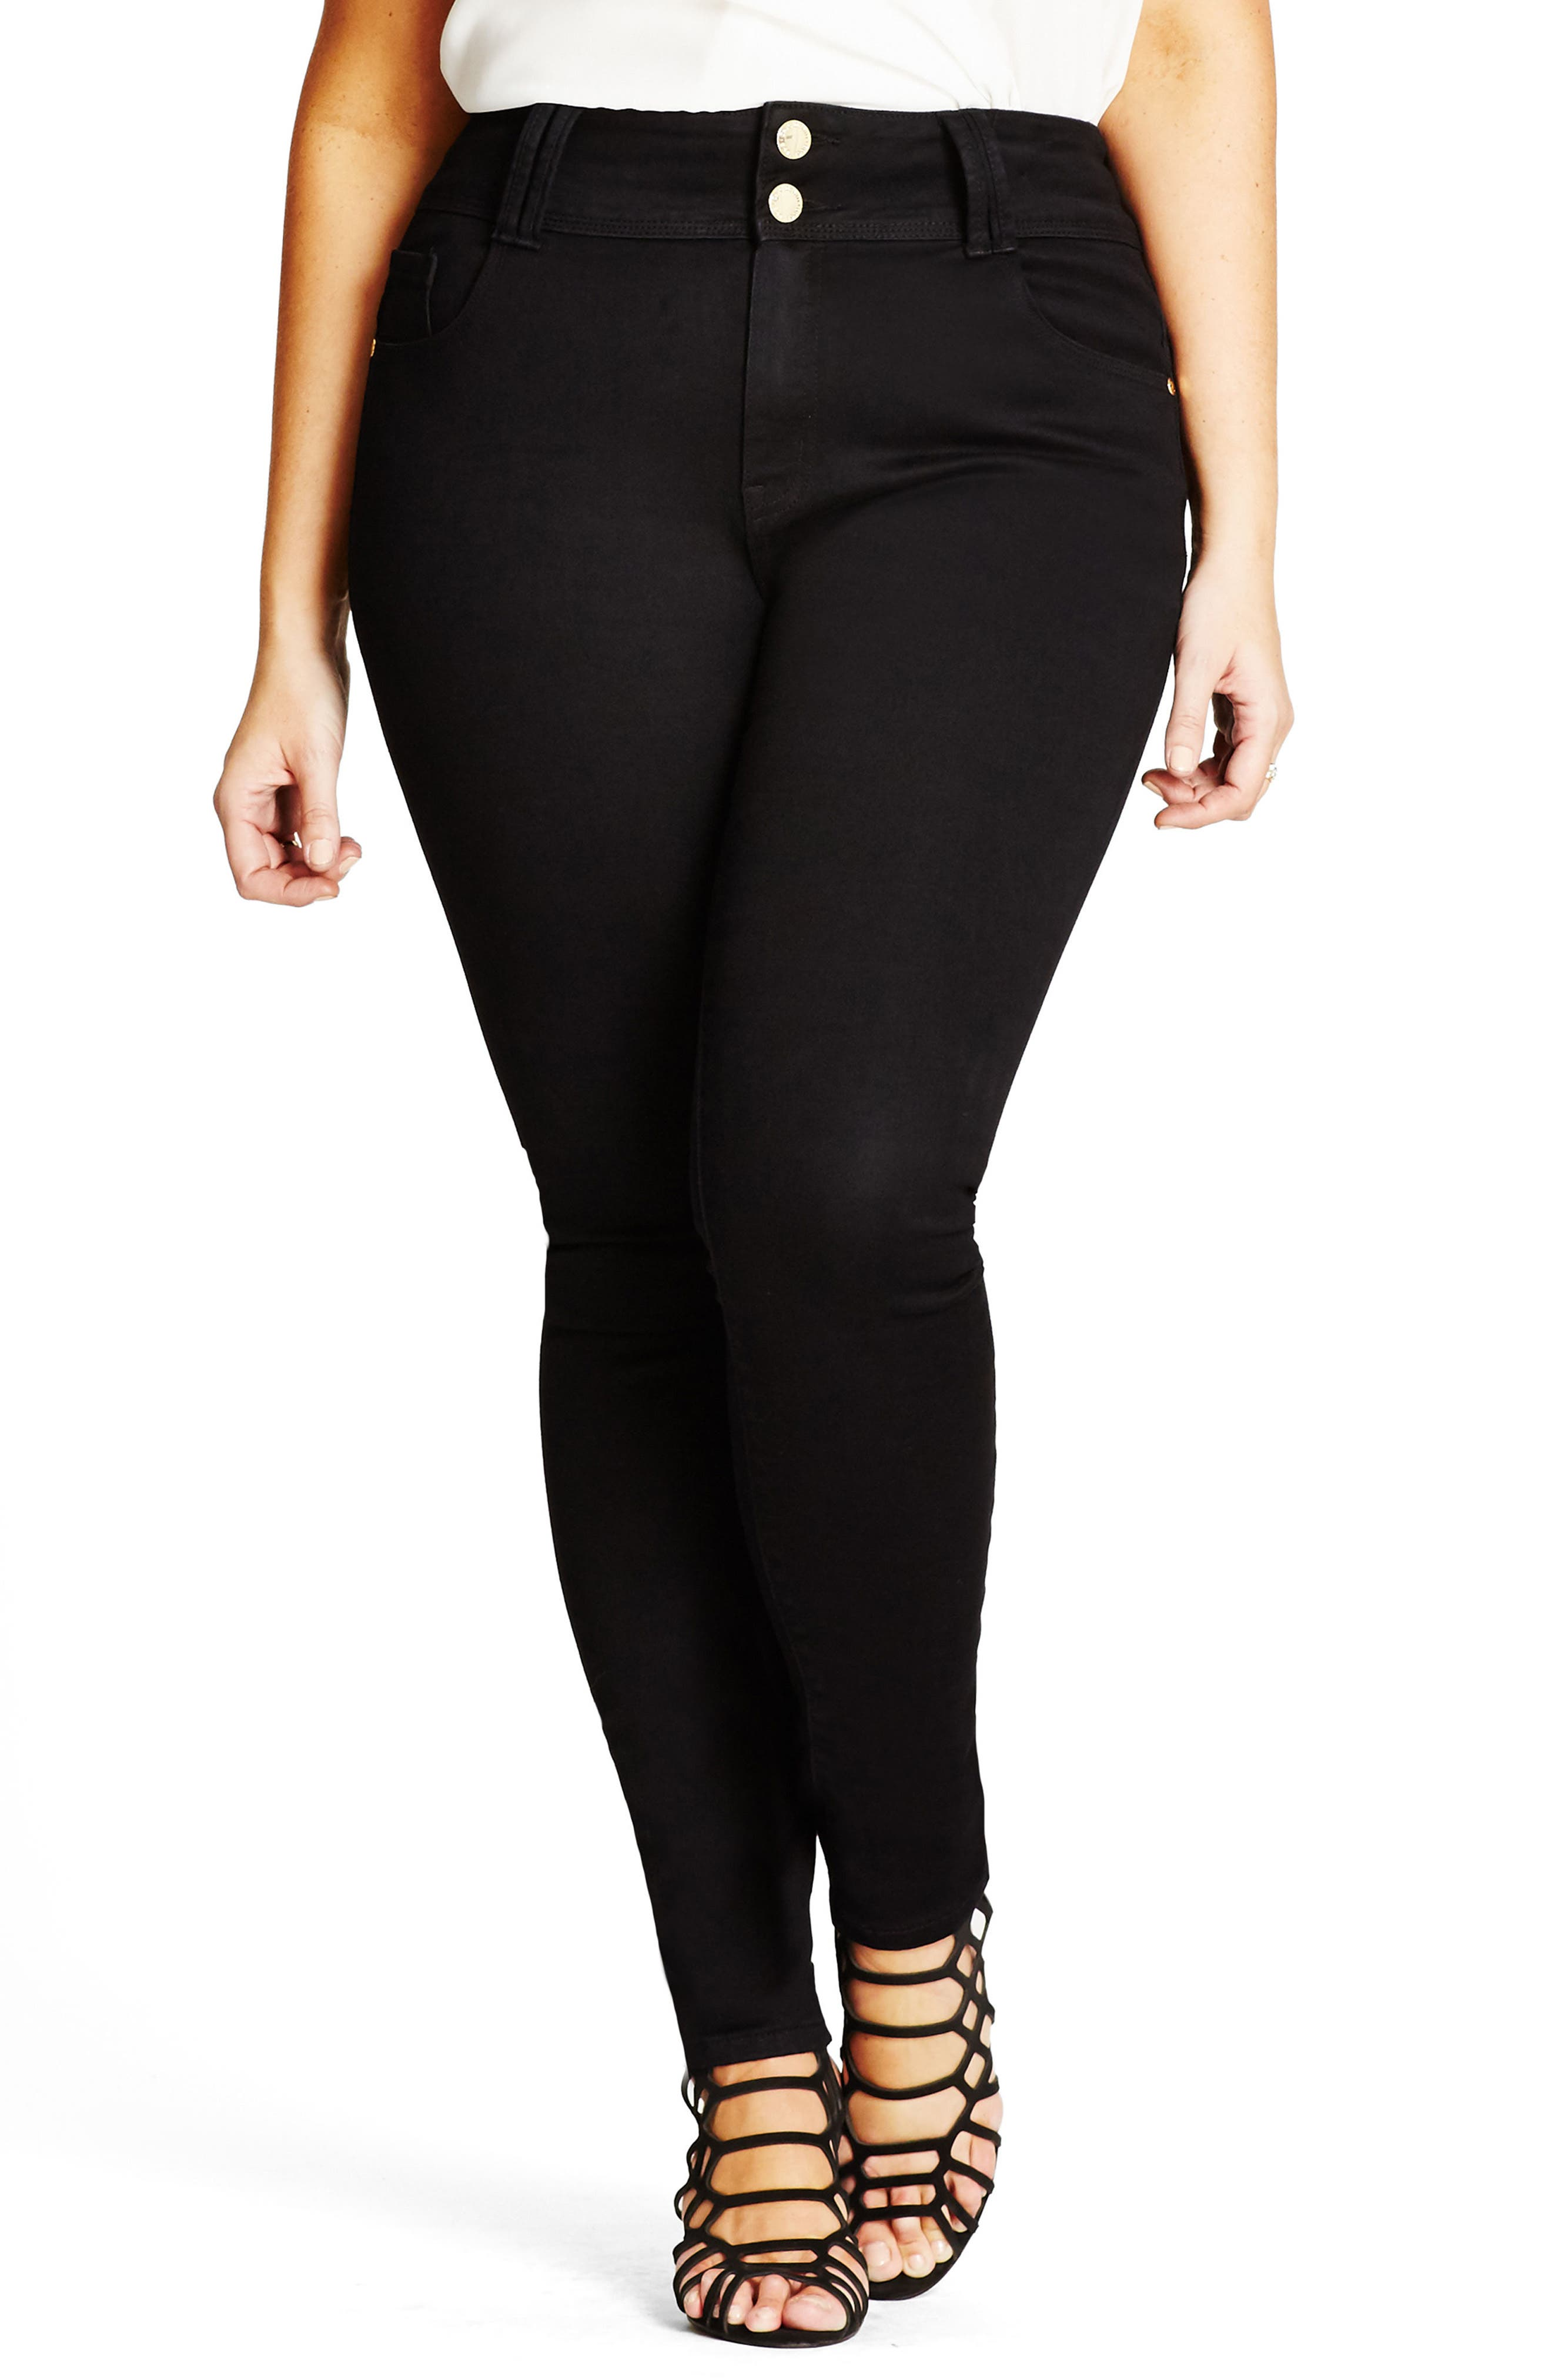 Asha High Waist Skinny Jeans,                             Main thumbnail 1, color,                             BLACK